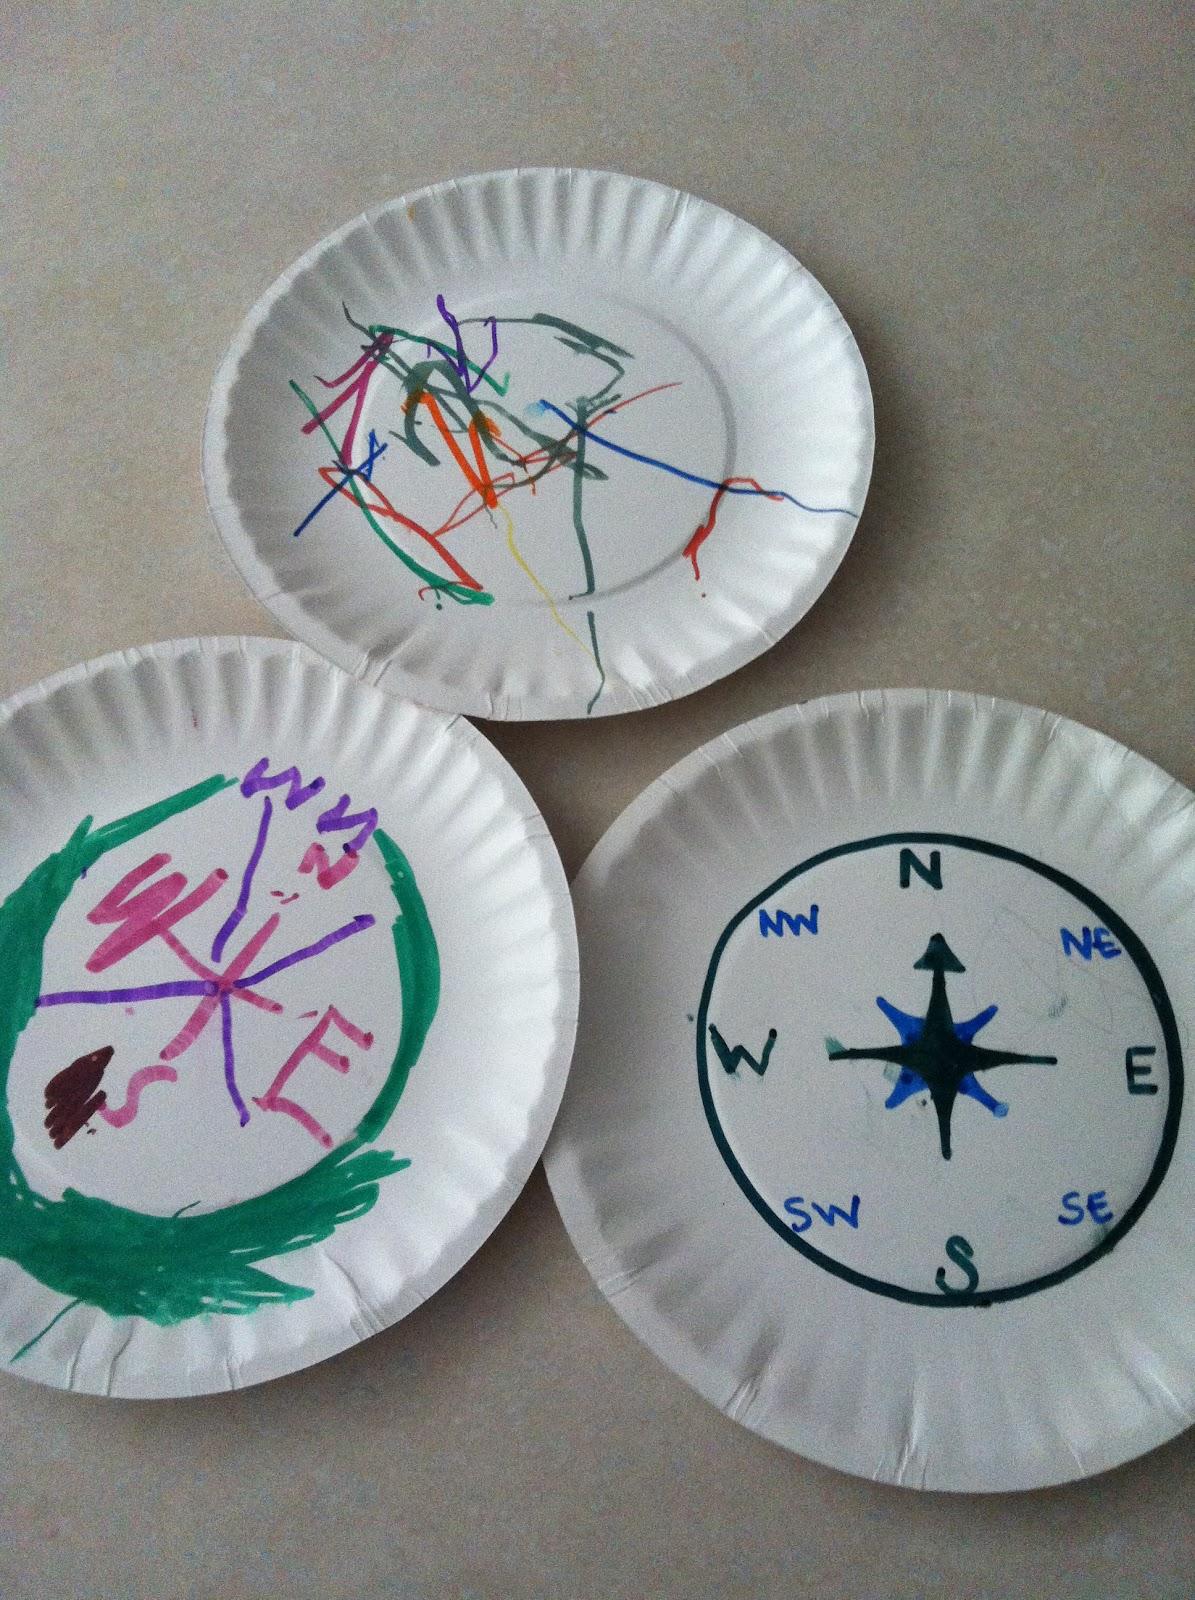 Handmade By Cj Preschool Pirate Projects